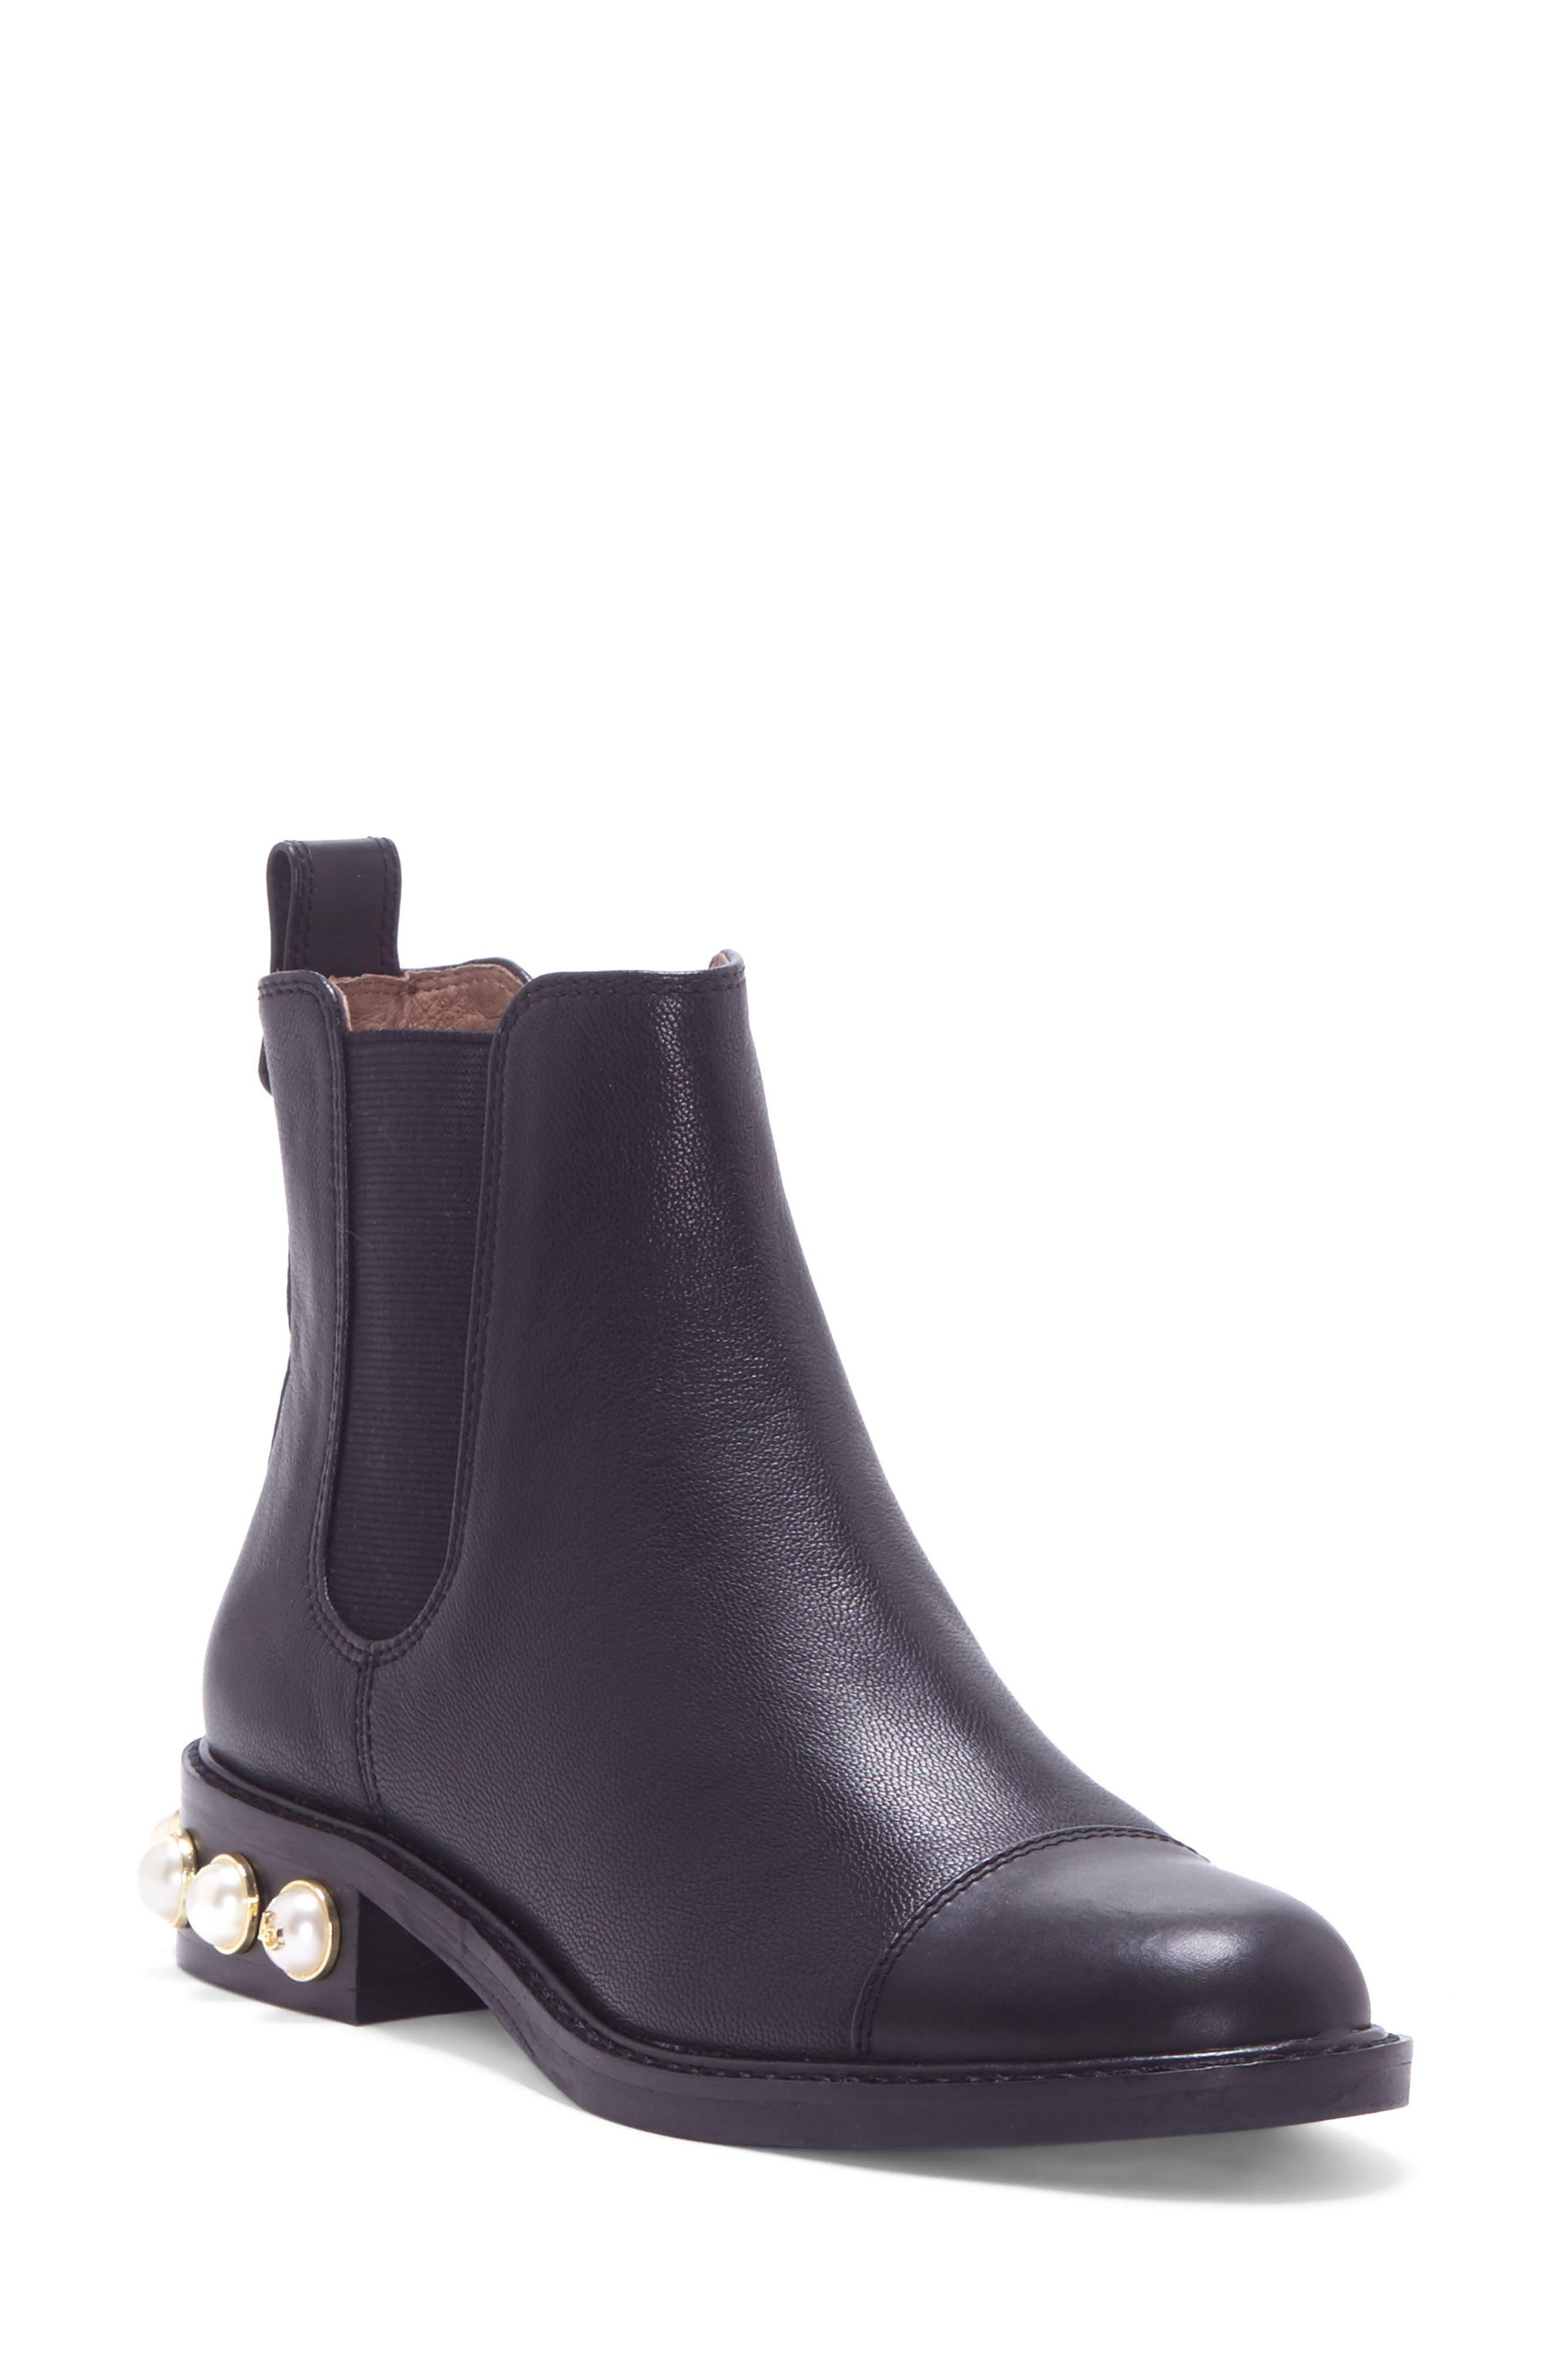 Main Image - Louise et Cie Vinn Imitation Pearl Boot (Women)